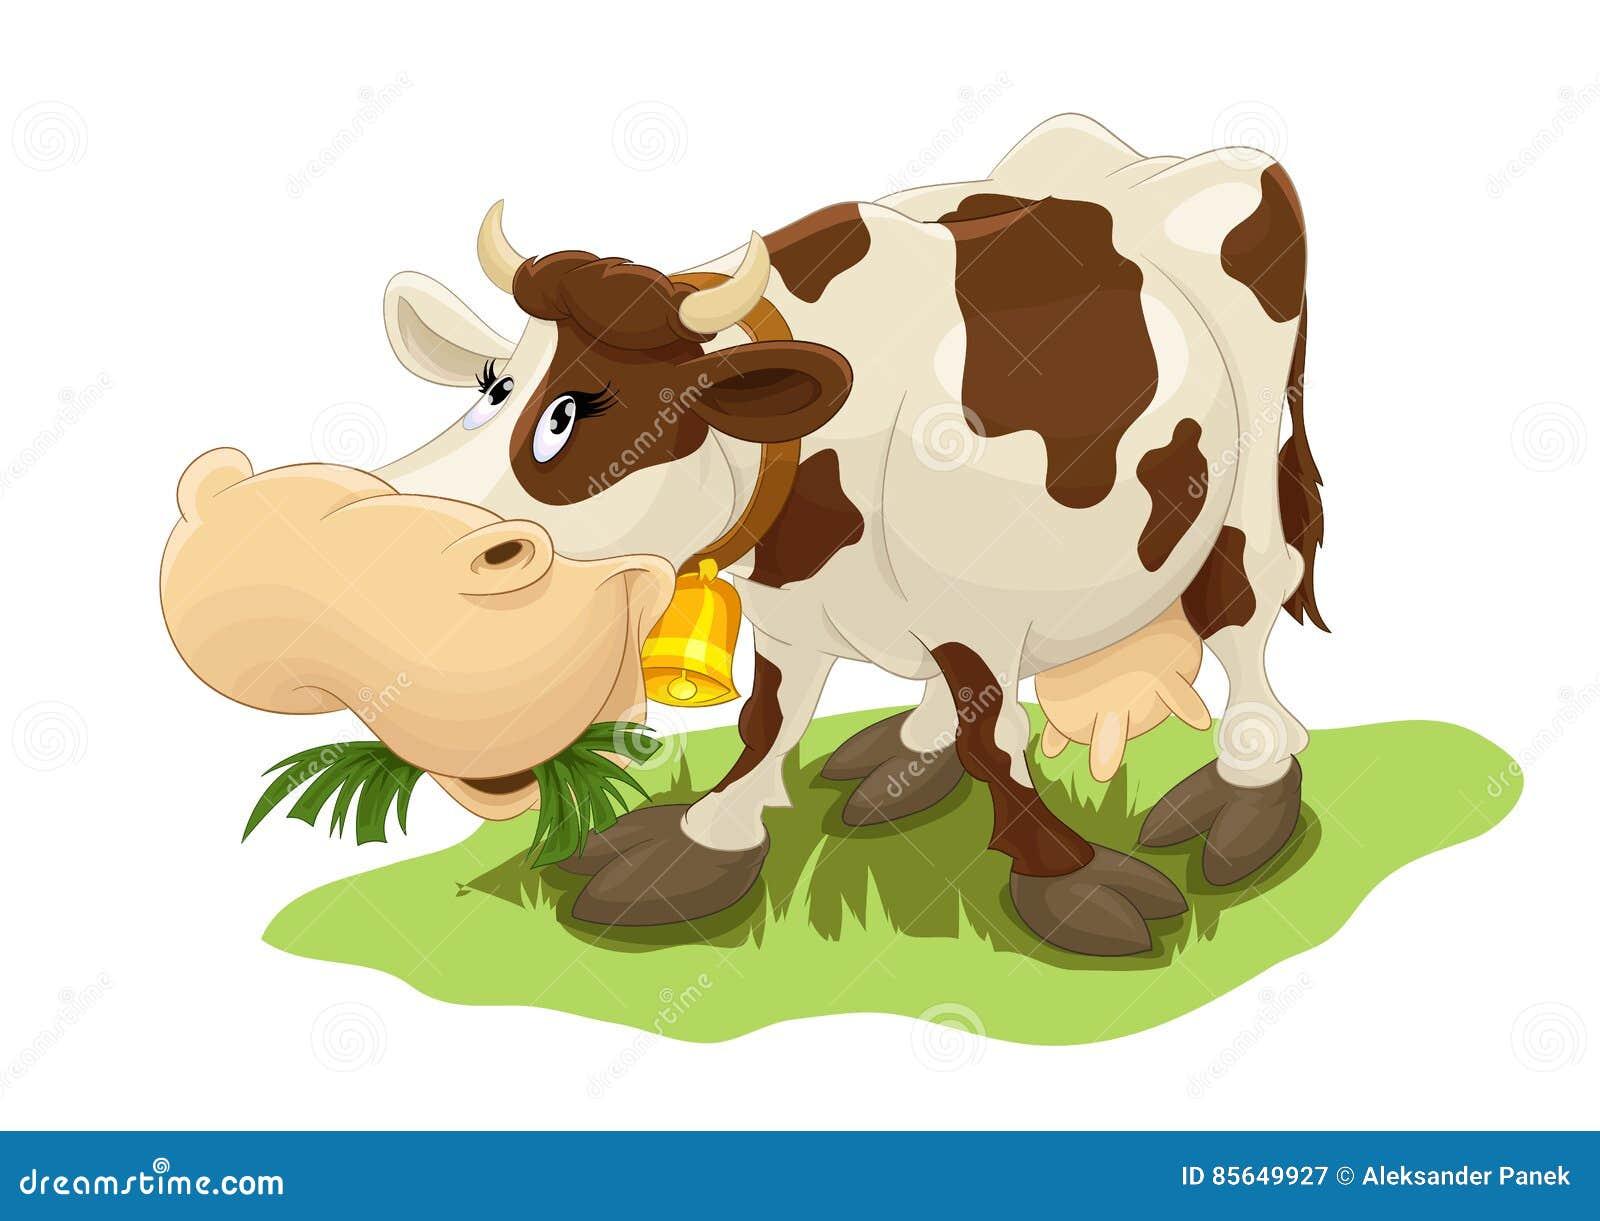 Imagenes Vacas Animadas: Cow Eating Grass Stock Illustrations